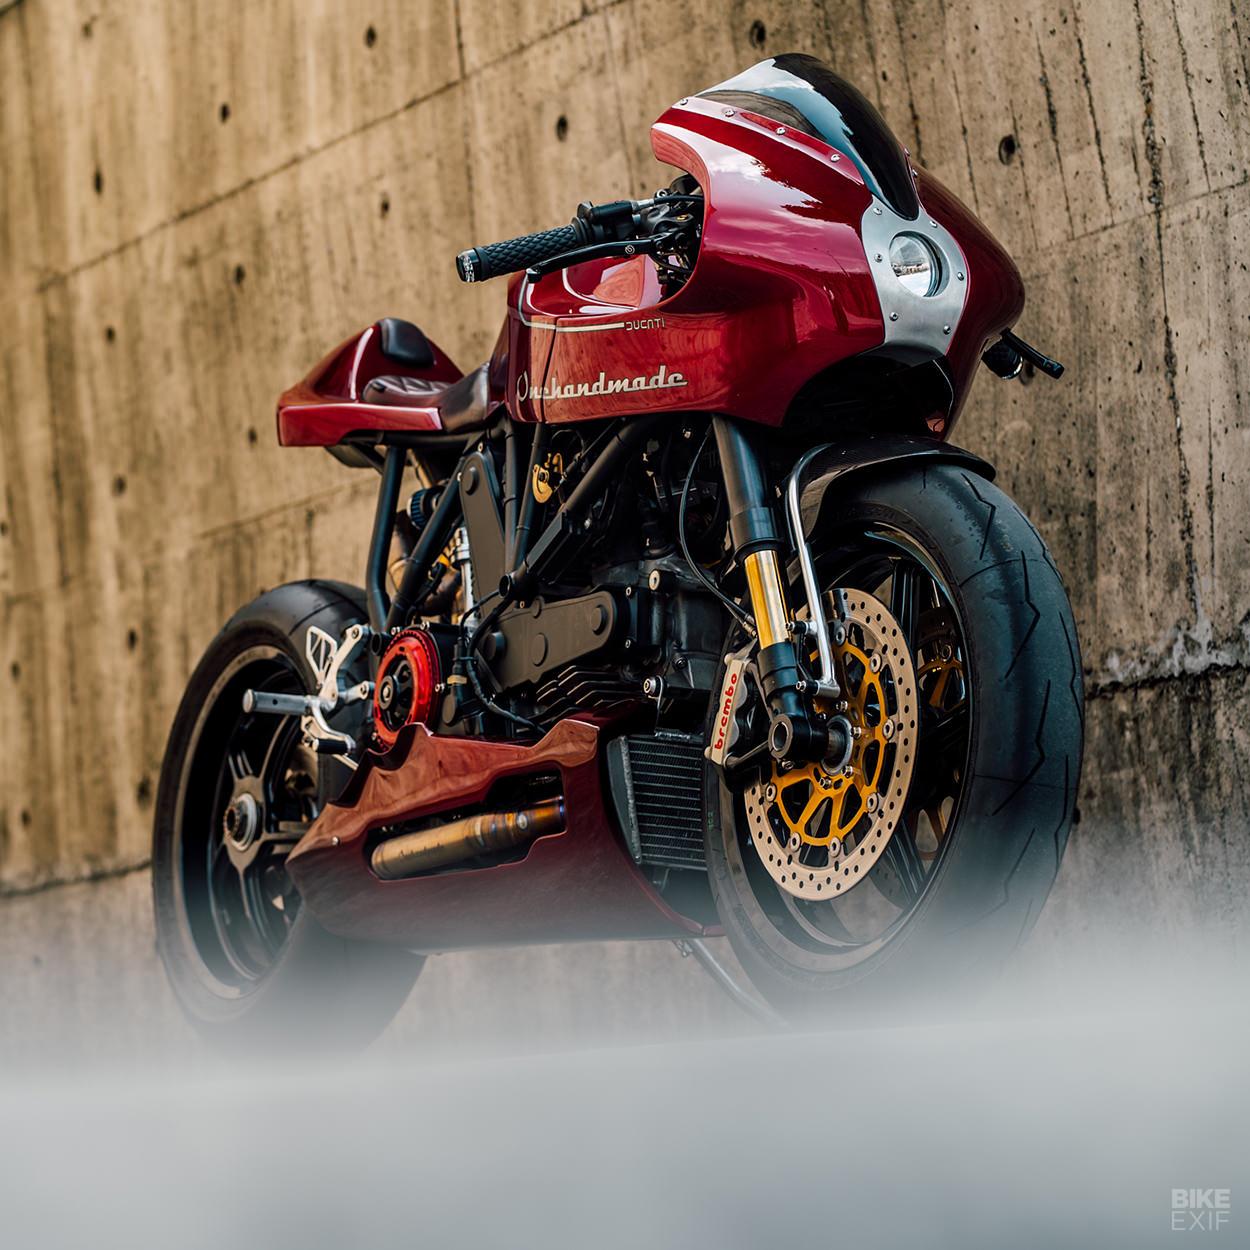 Ducati MH900e cafe racer by Onehandmade